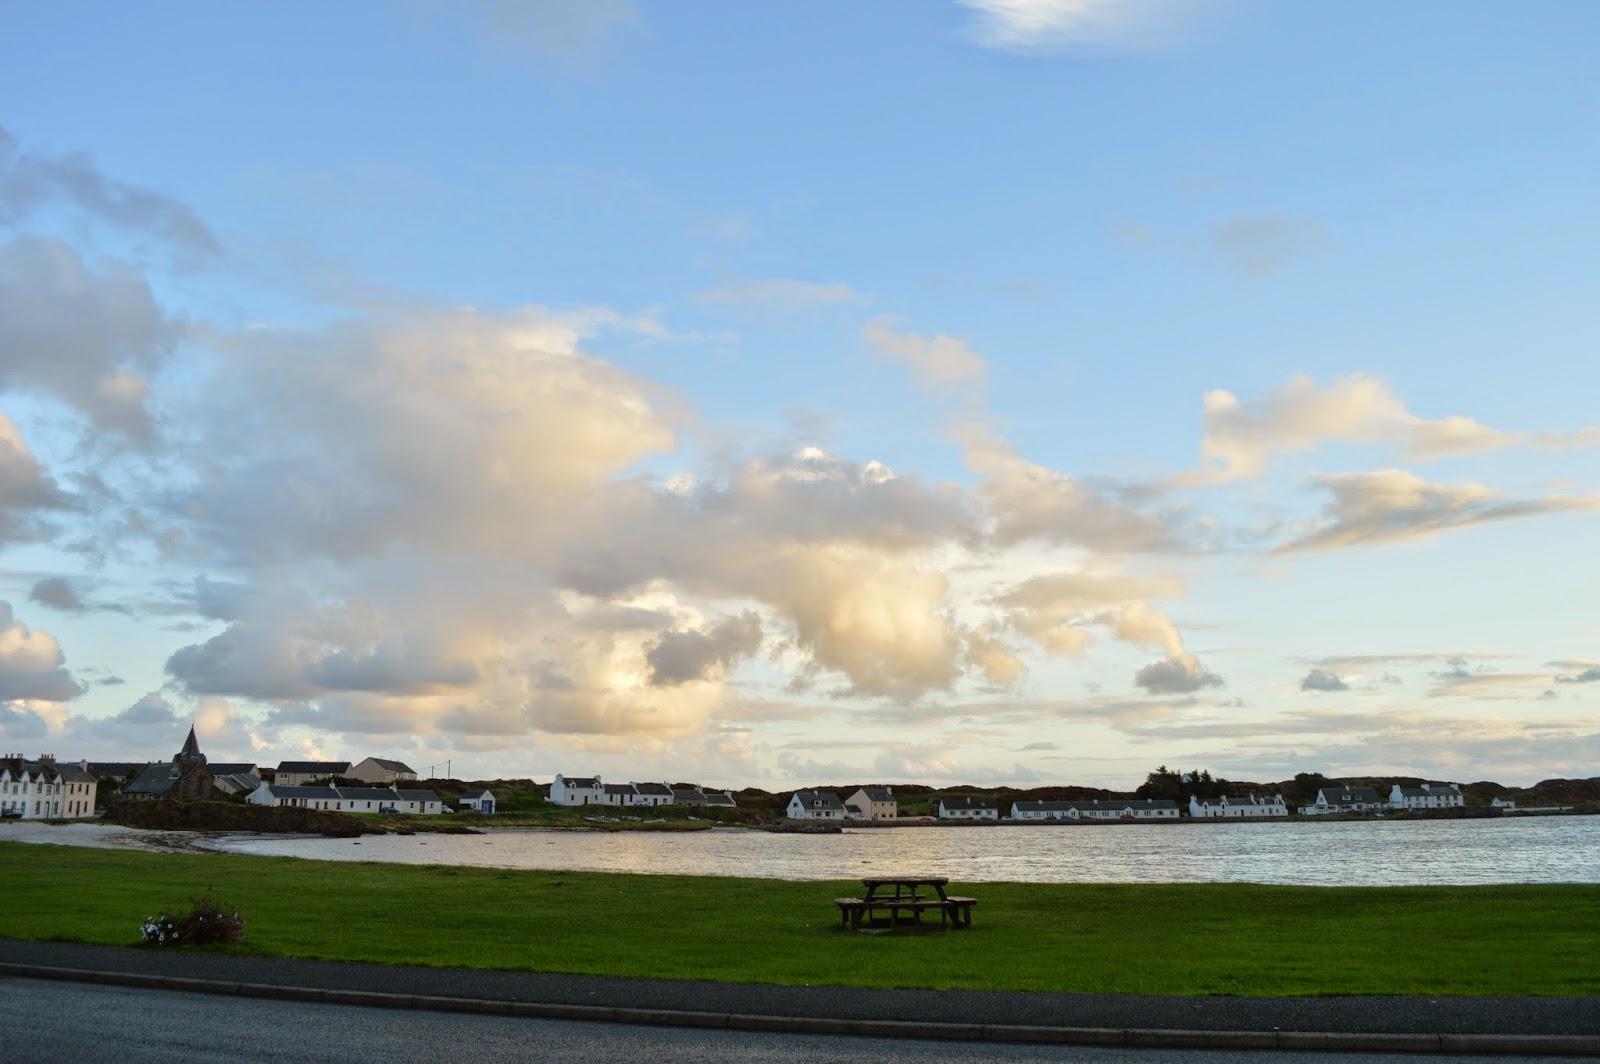 Port Ellen, Islay, Scotlant